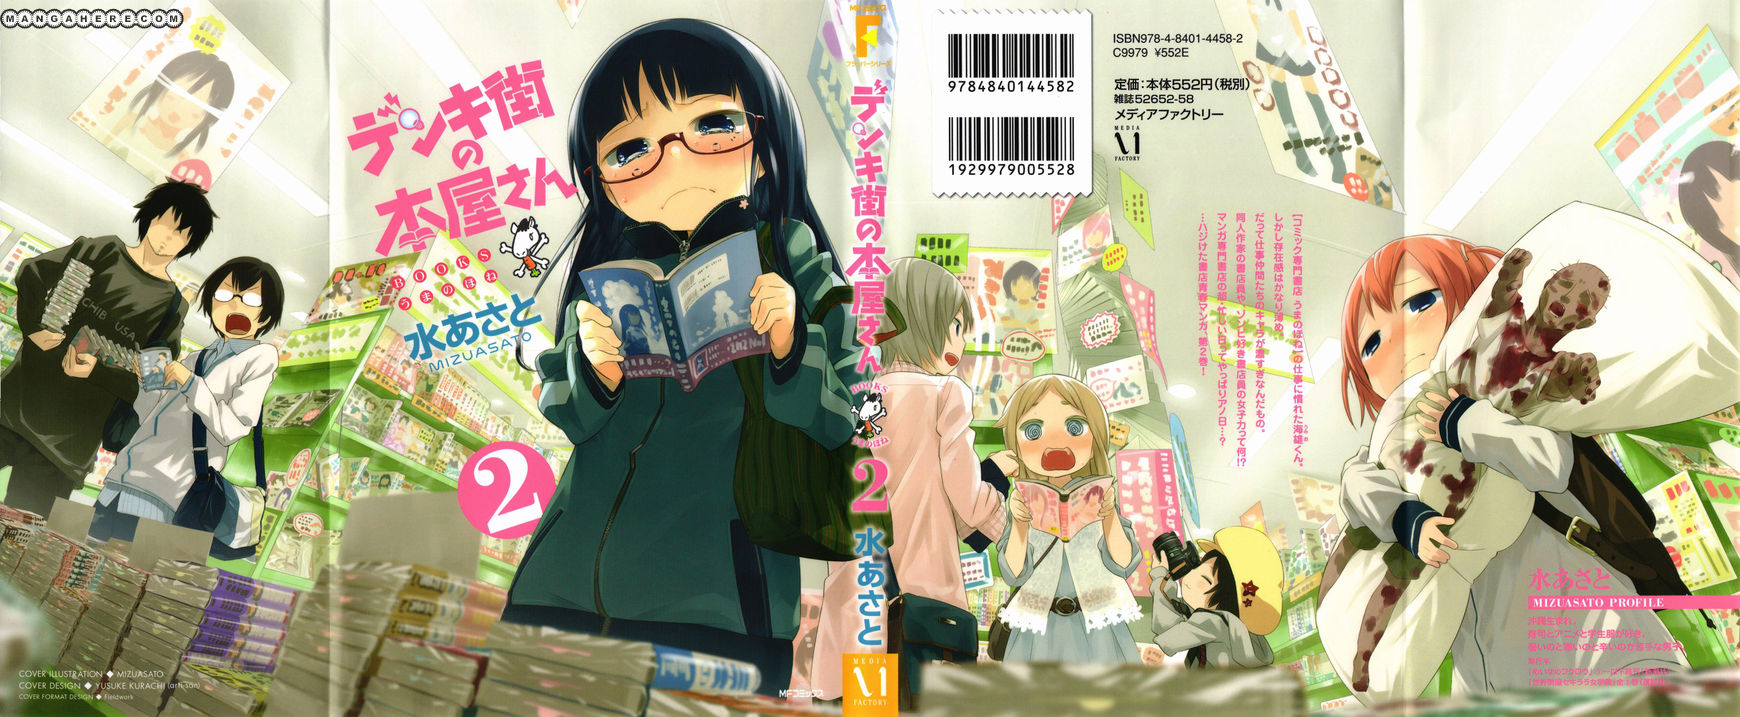 Denkigai no Honya-san 6 Page 1